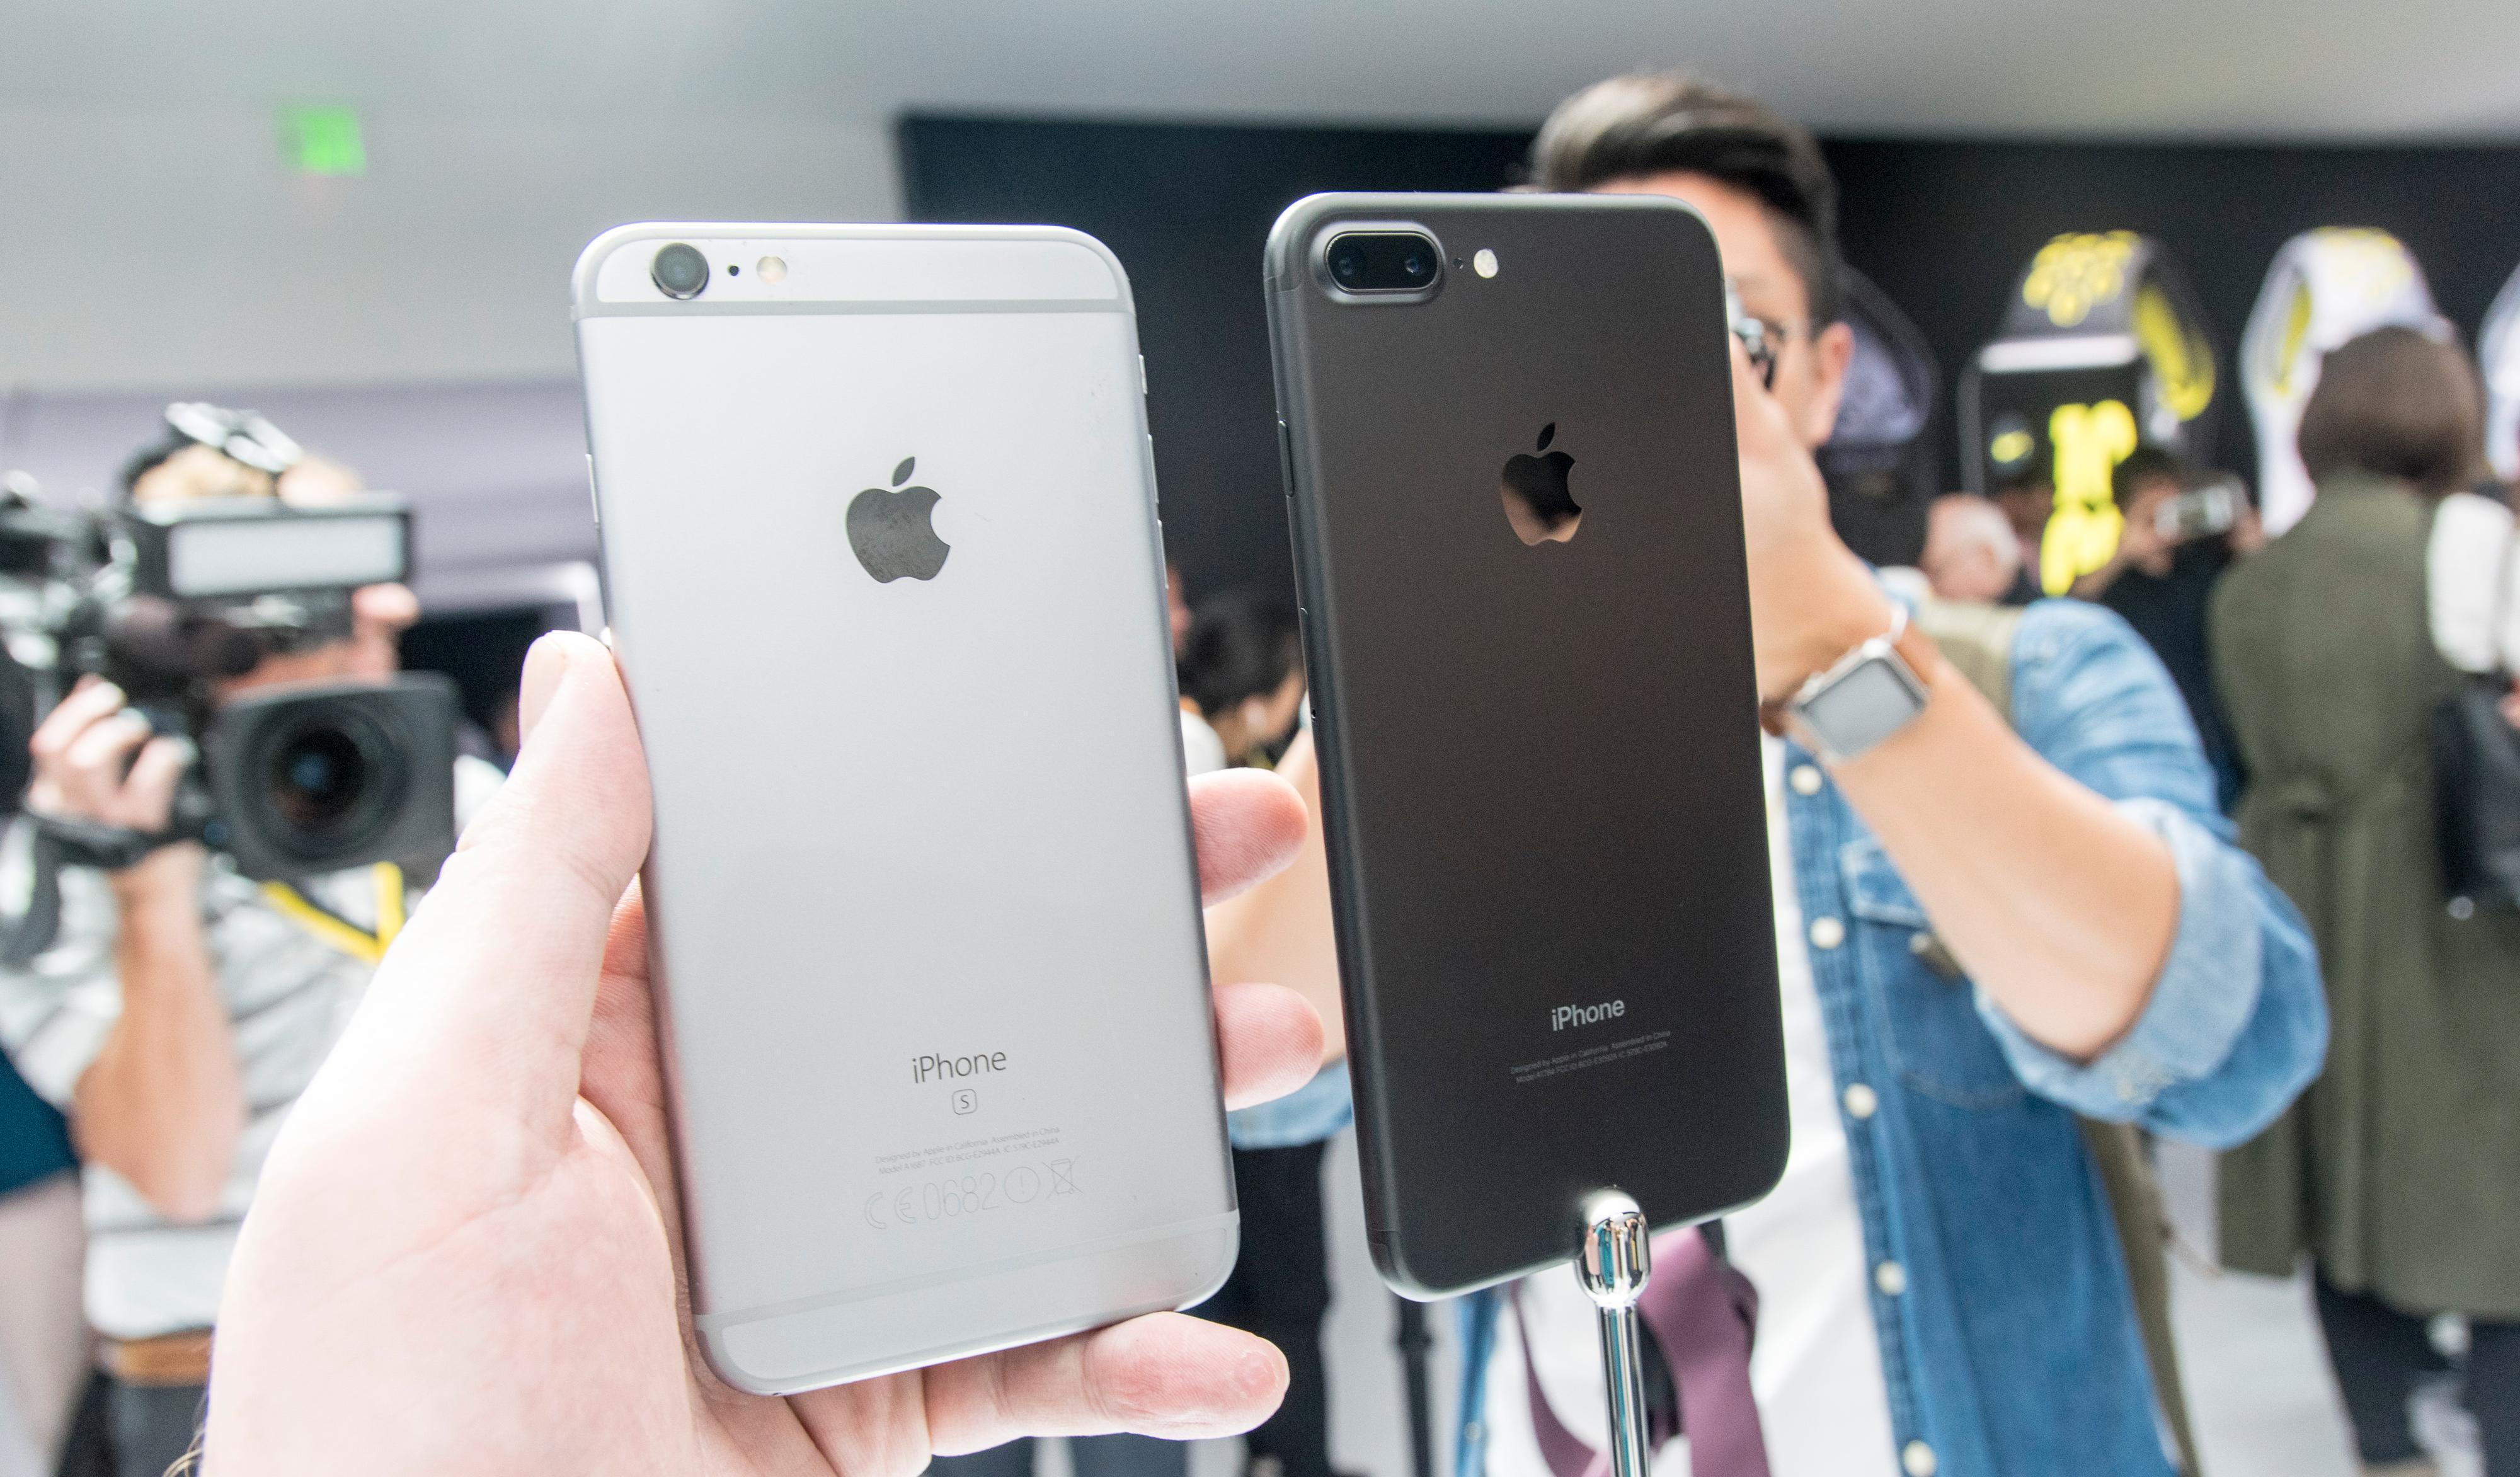 iPhone 6S Plus til venstre, iPhone 7 Plus til høyre.